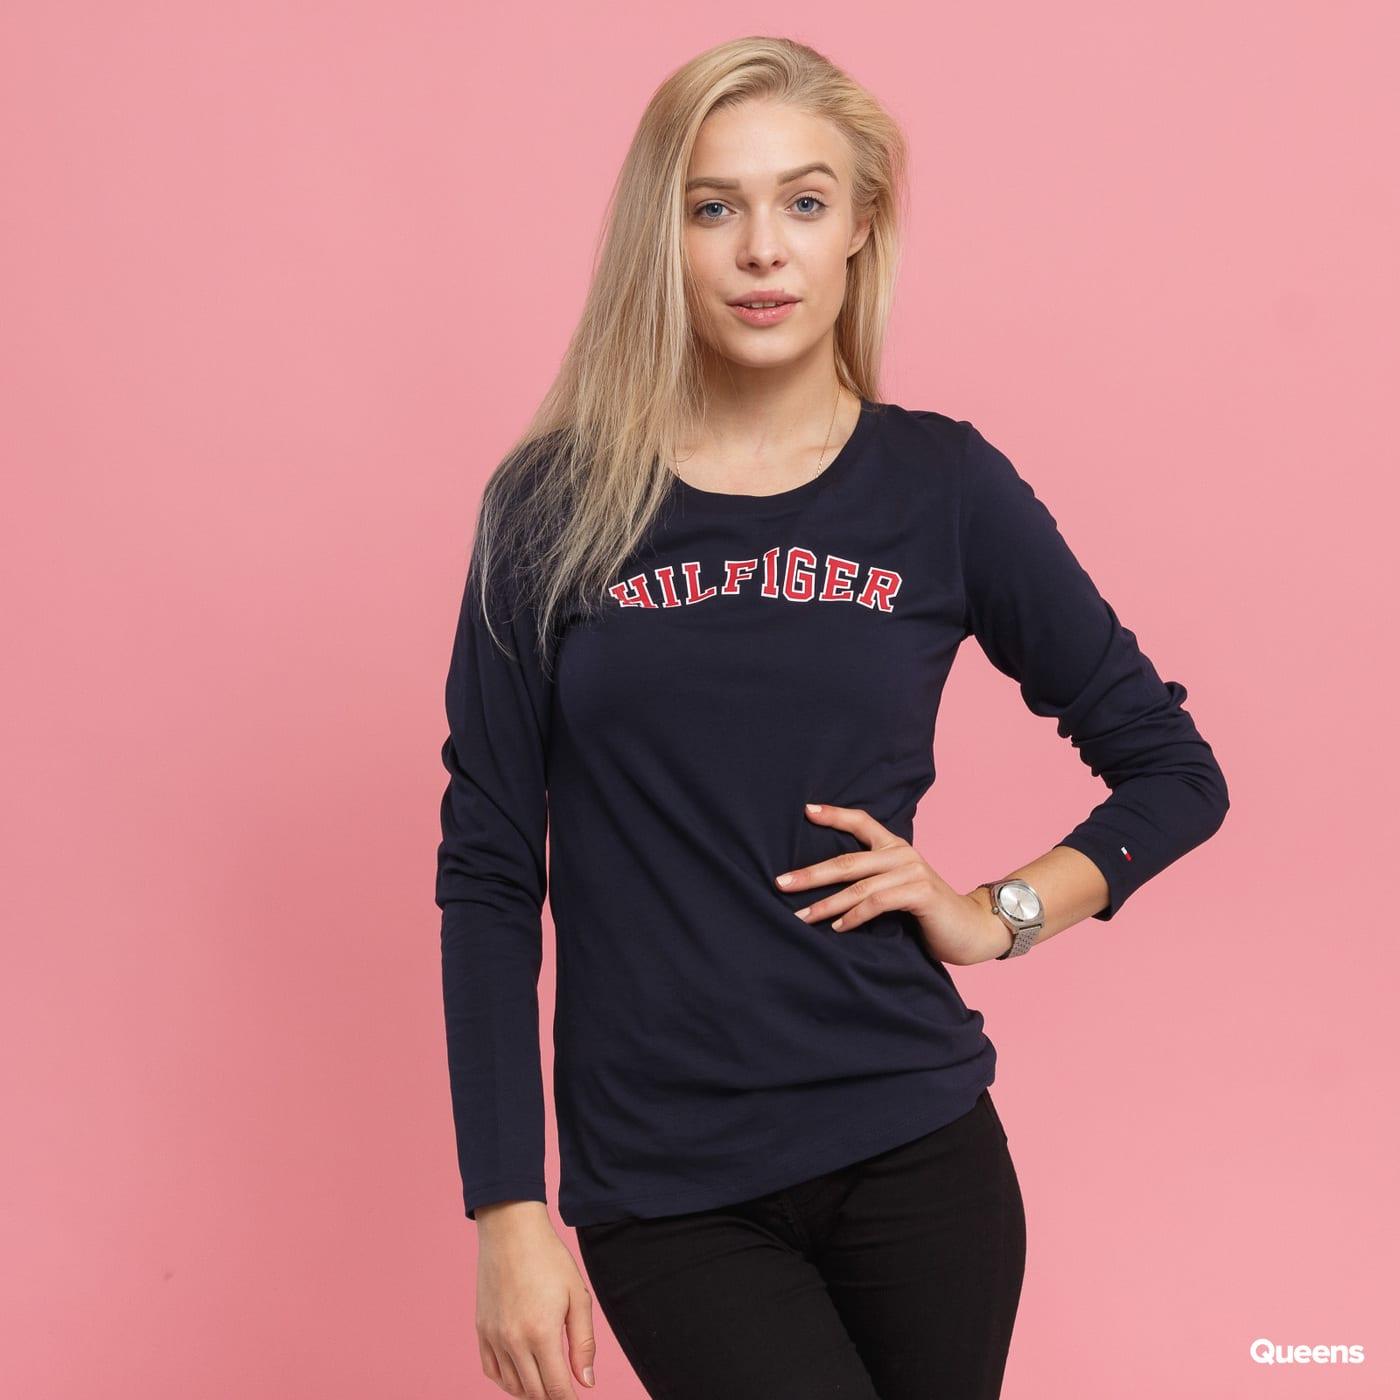 af92f6ae79 Dámske tričko s dlhým rukávom Tommy Hilfiger CN Tee LS Logo (UW0UW01413  416)– Queens 💚